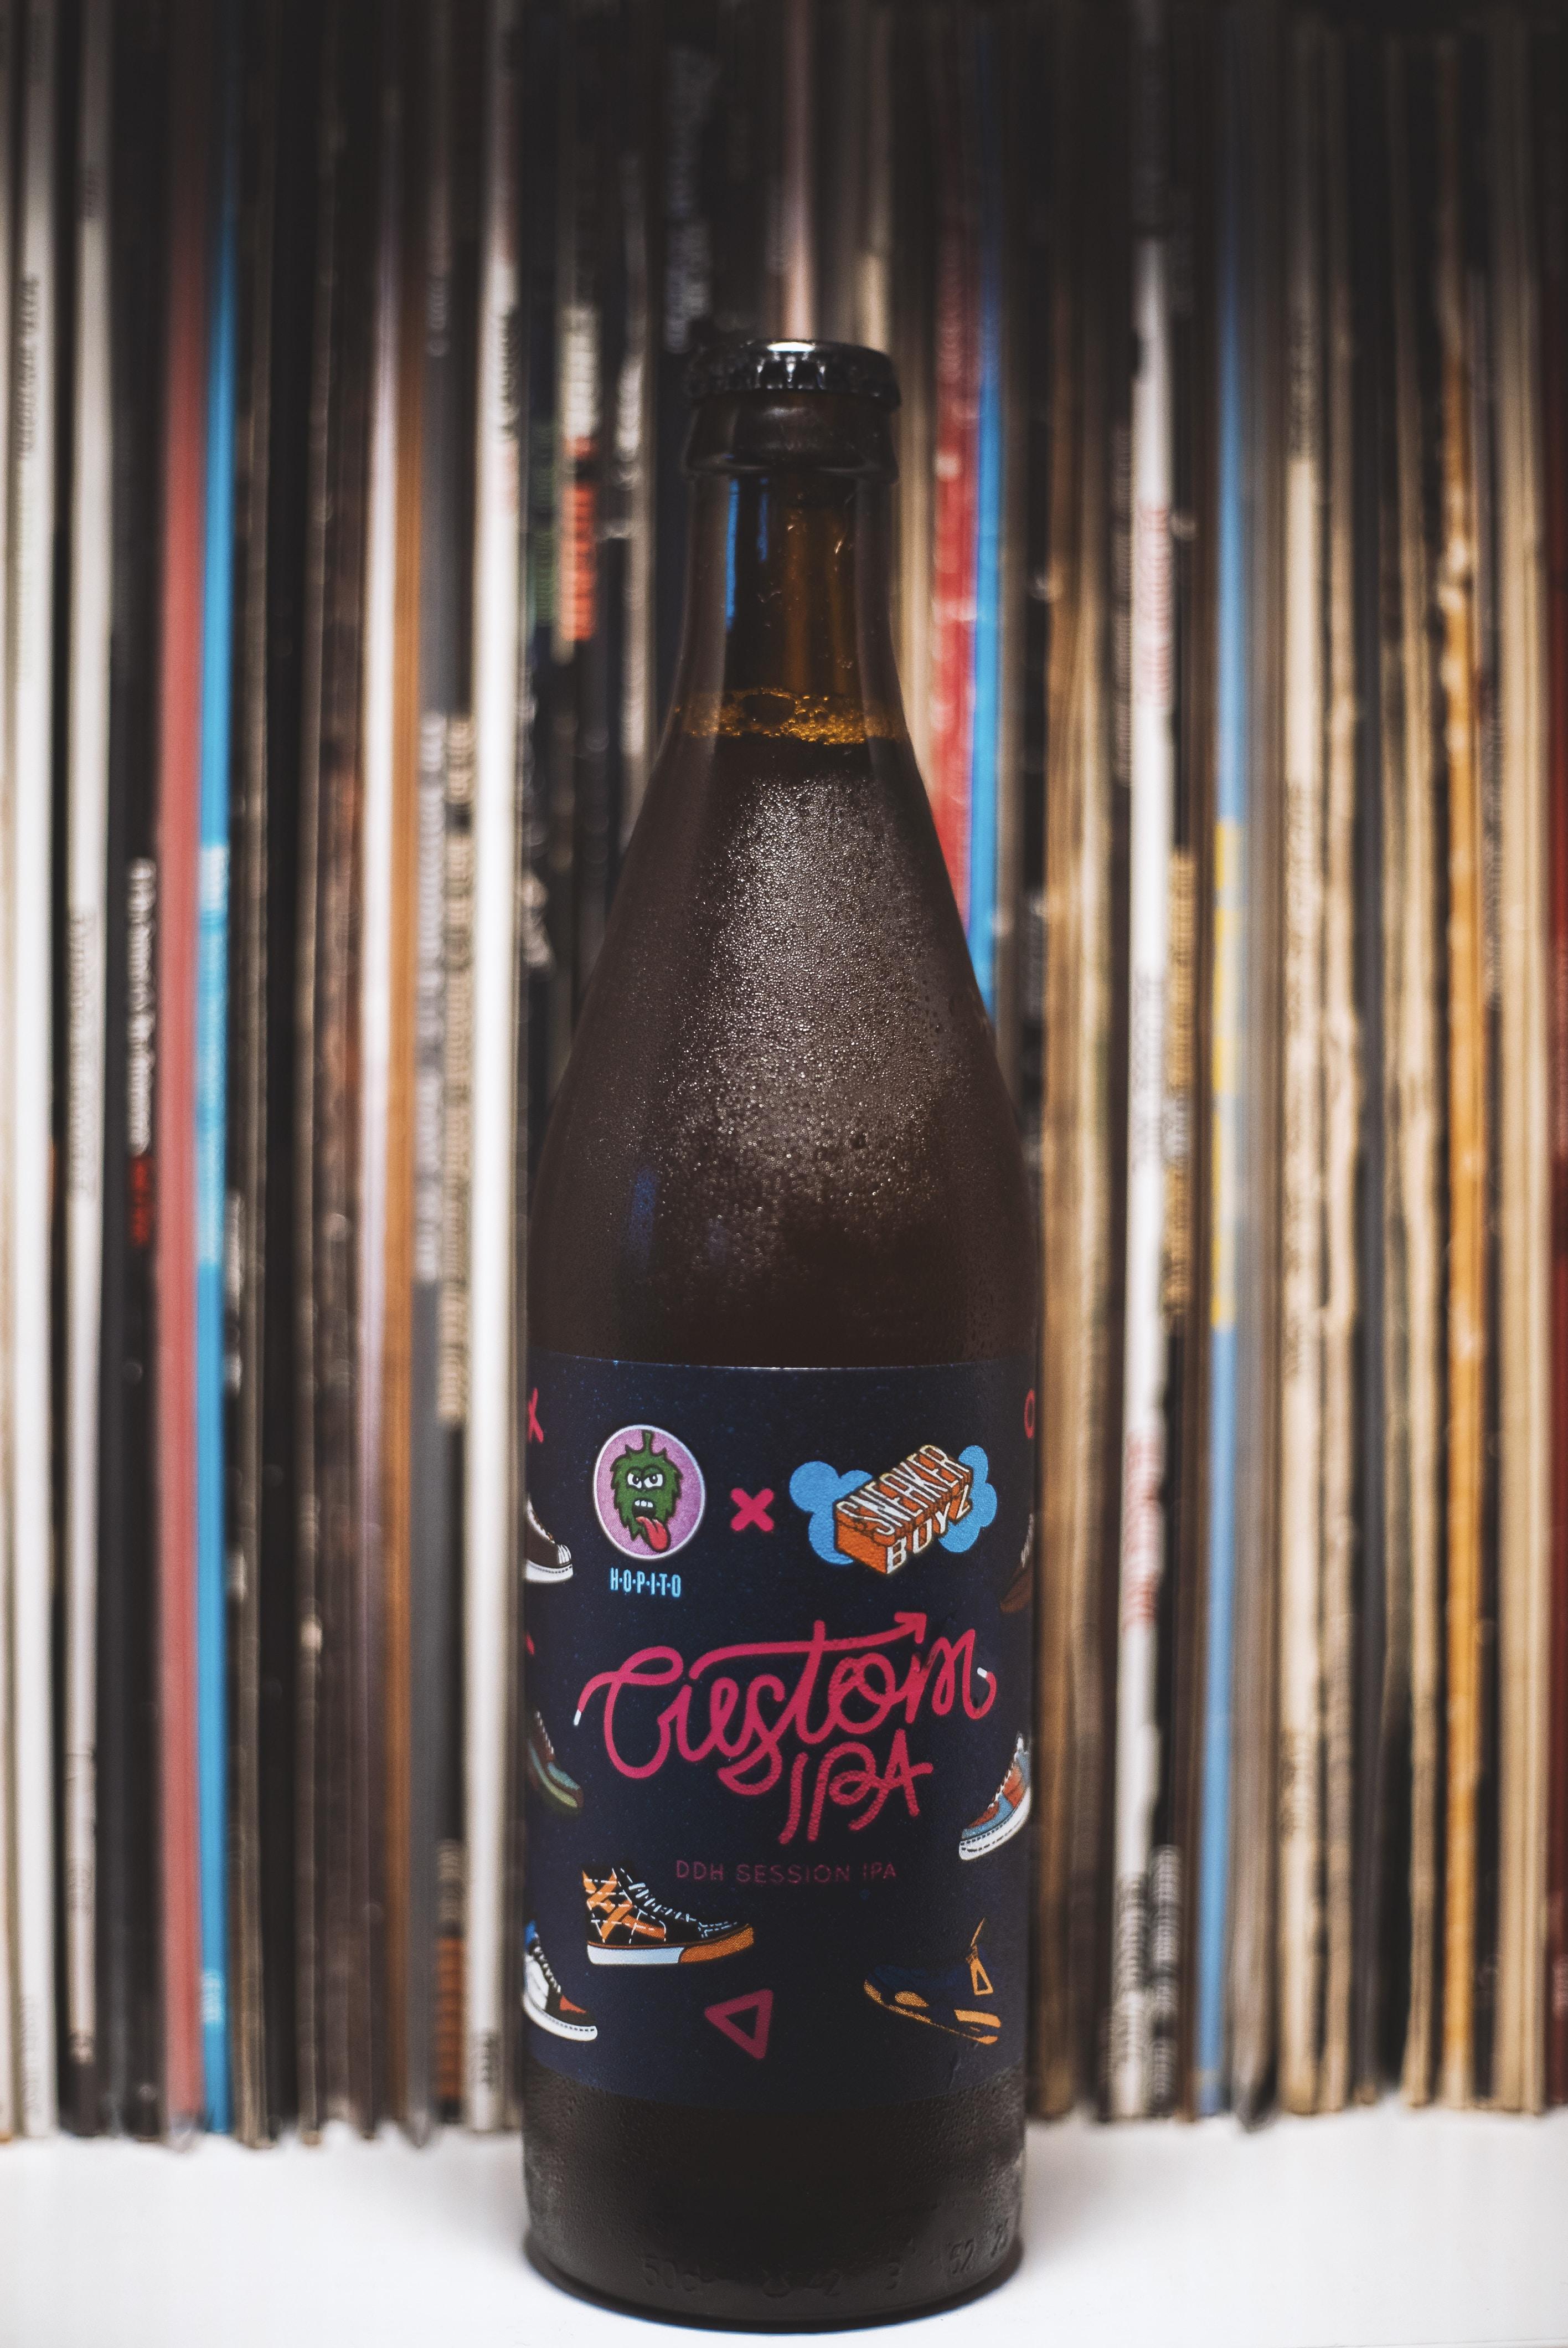 Custom Ipa bottle on white surface